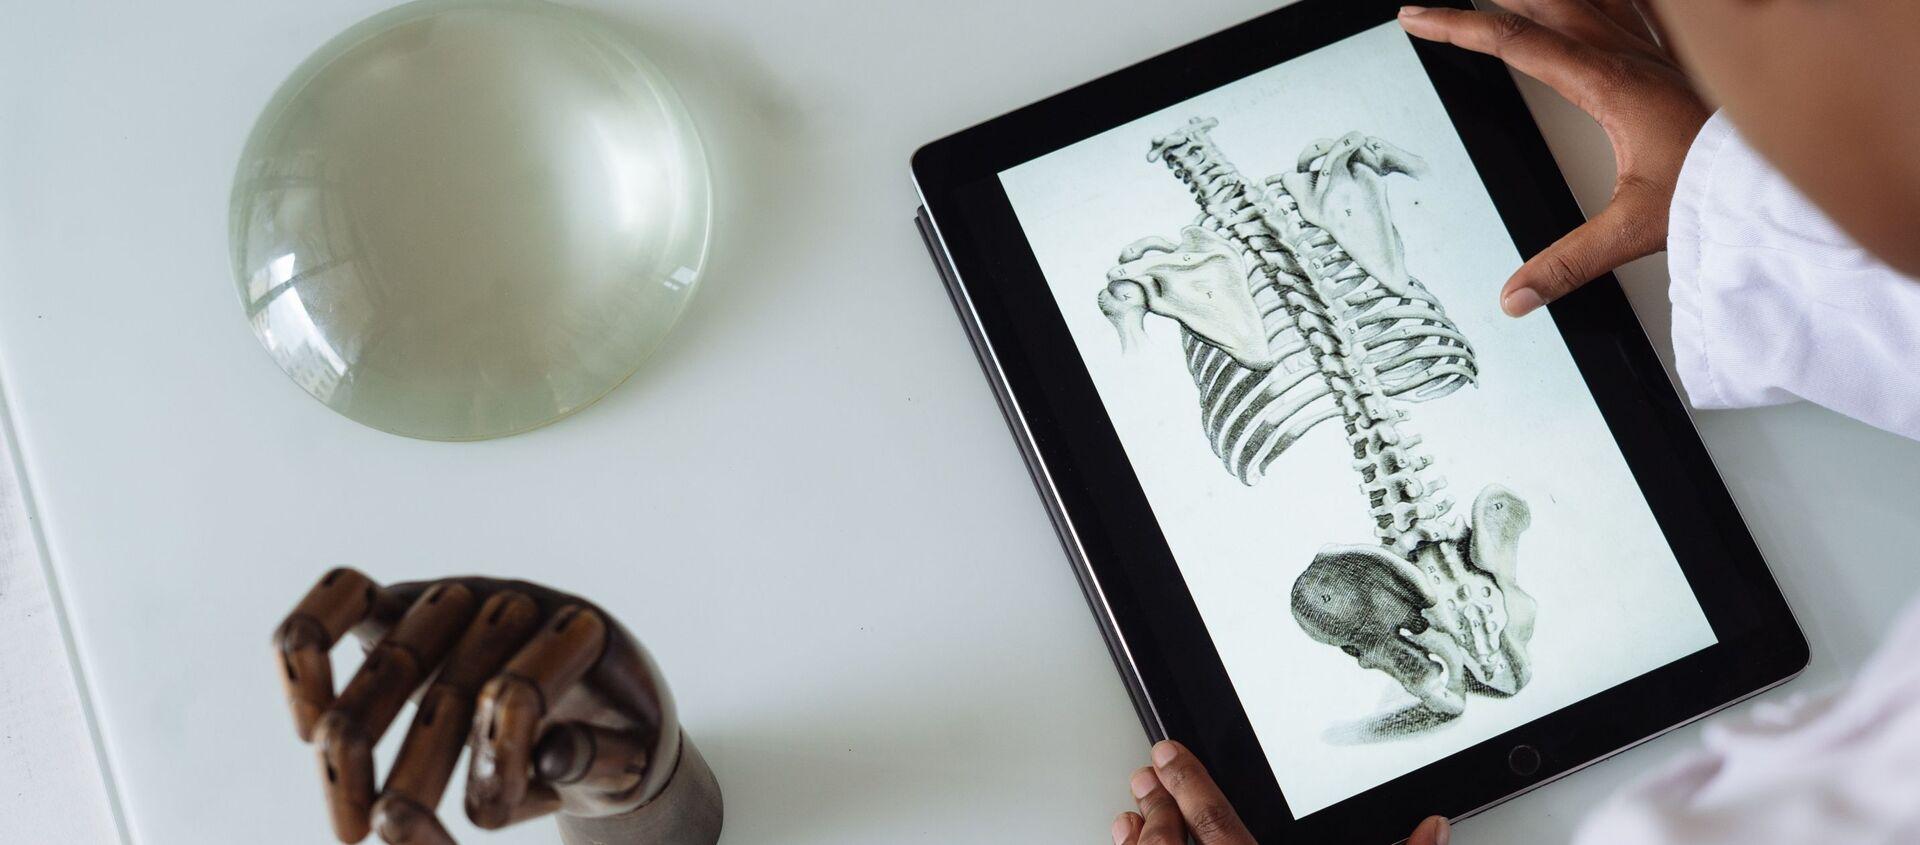 Скелет человека на экране планшета  - Sputnik Абхазия, 1920, 17.05.2021